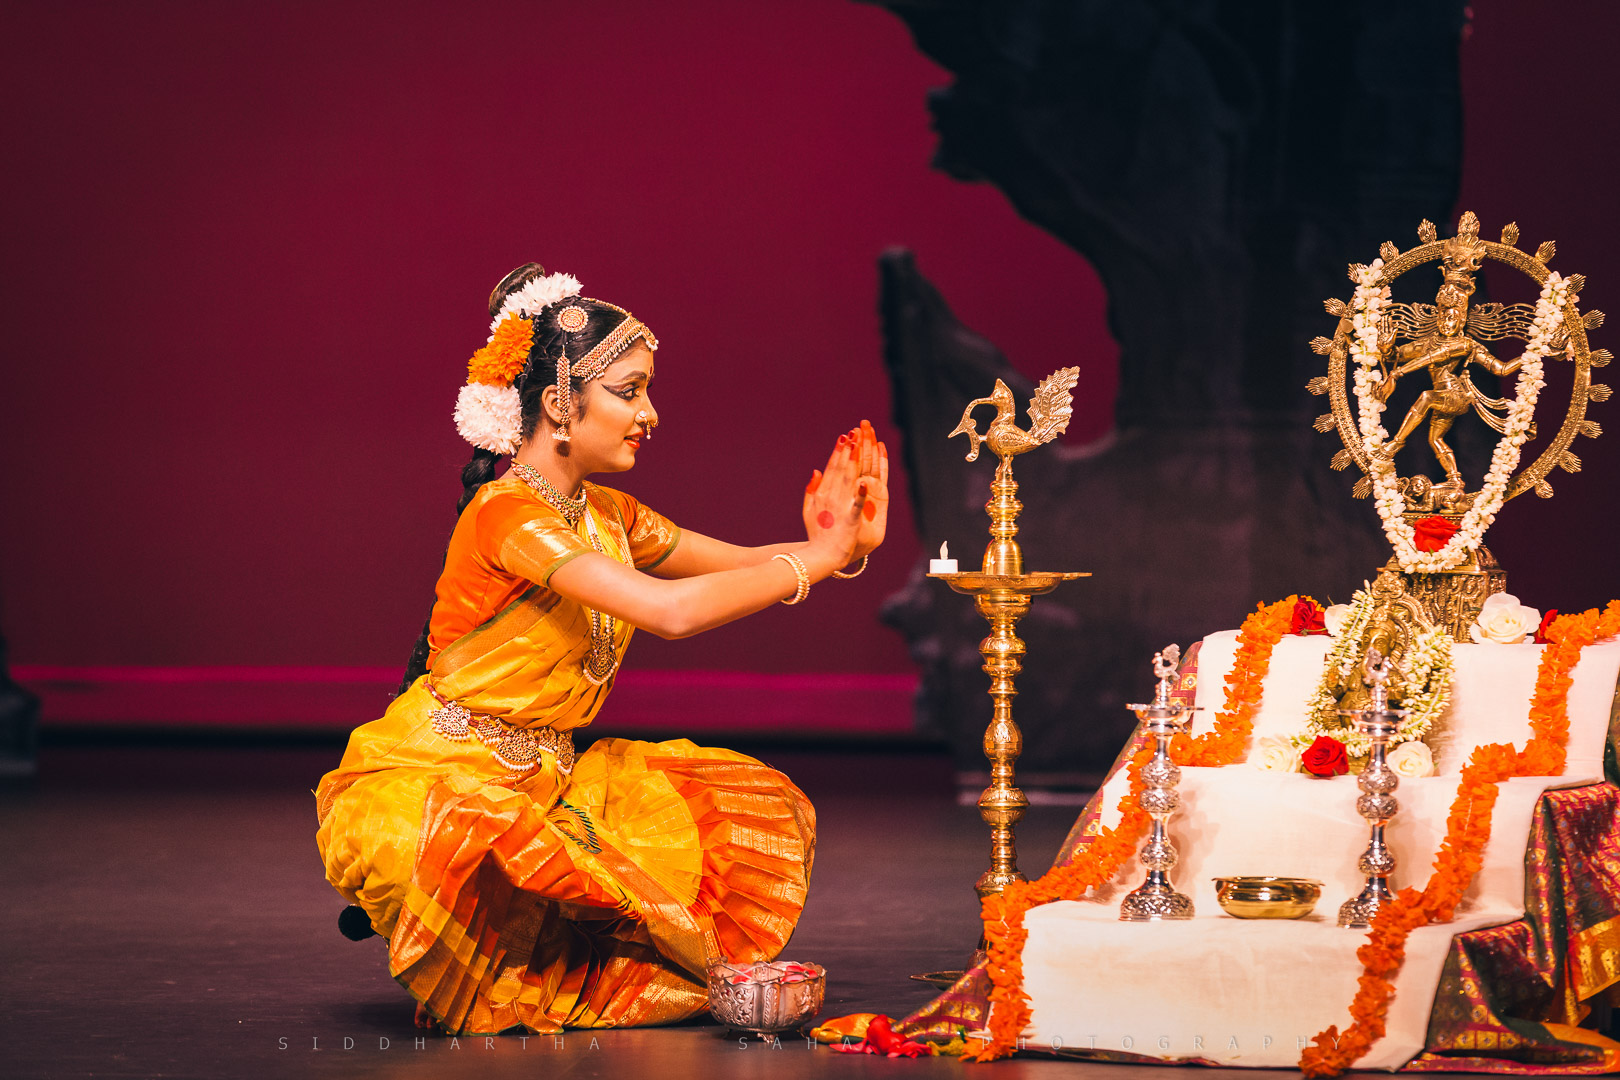 2015-07-25 - Kamaniya's Arangetram - _05Y2613